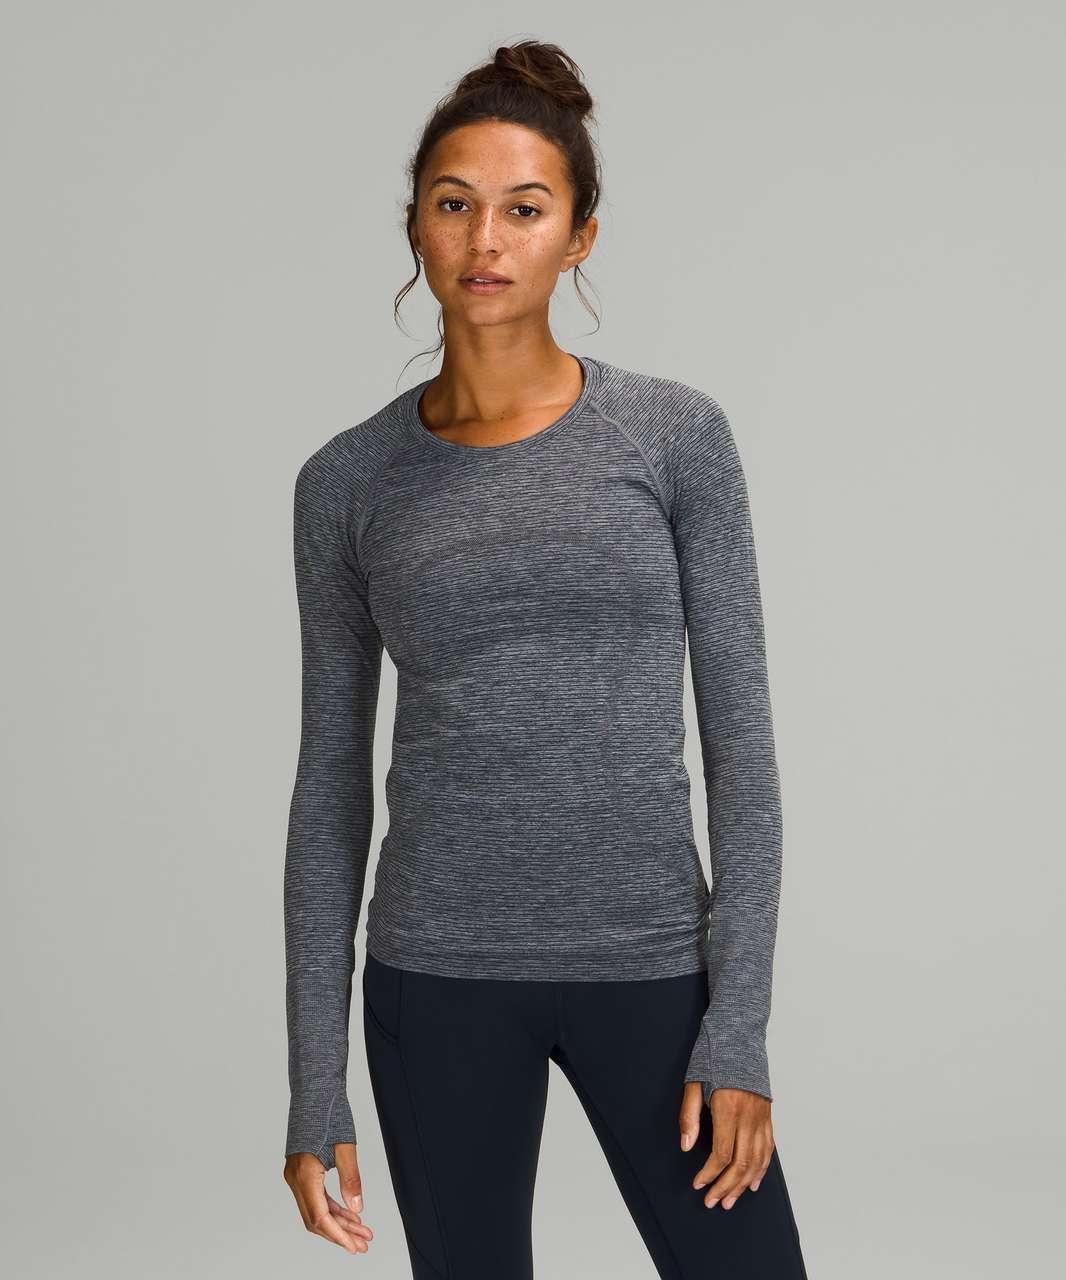 Lululemon Swiftly Tech Long Sleeve Shirt 2.0 - Tetra Stripe Classic Navy / True Navy / Alpine White / Rhino Grey